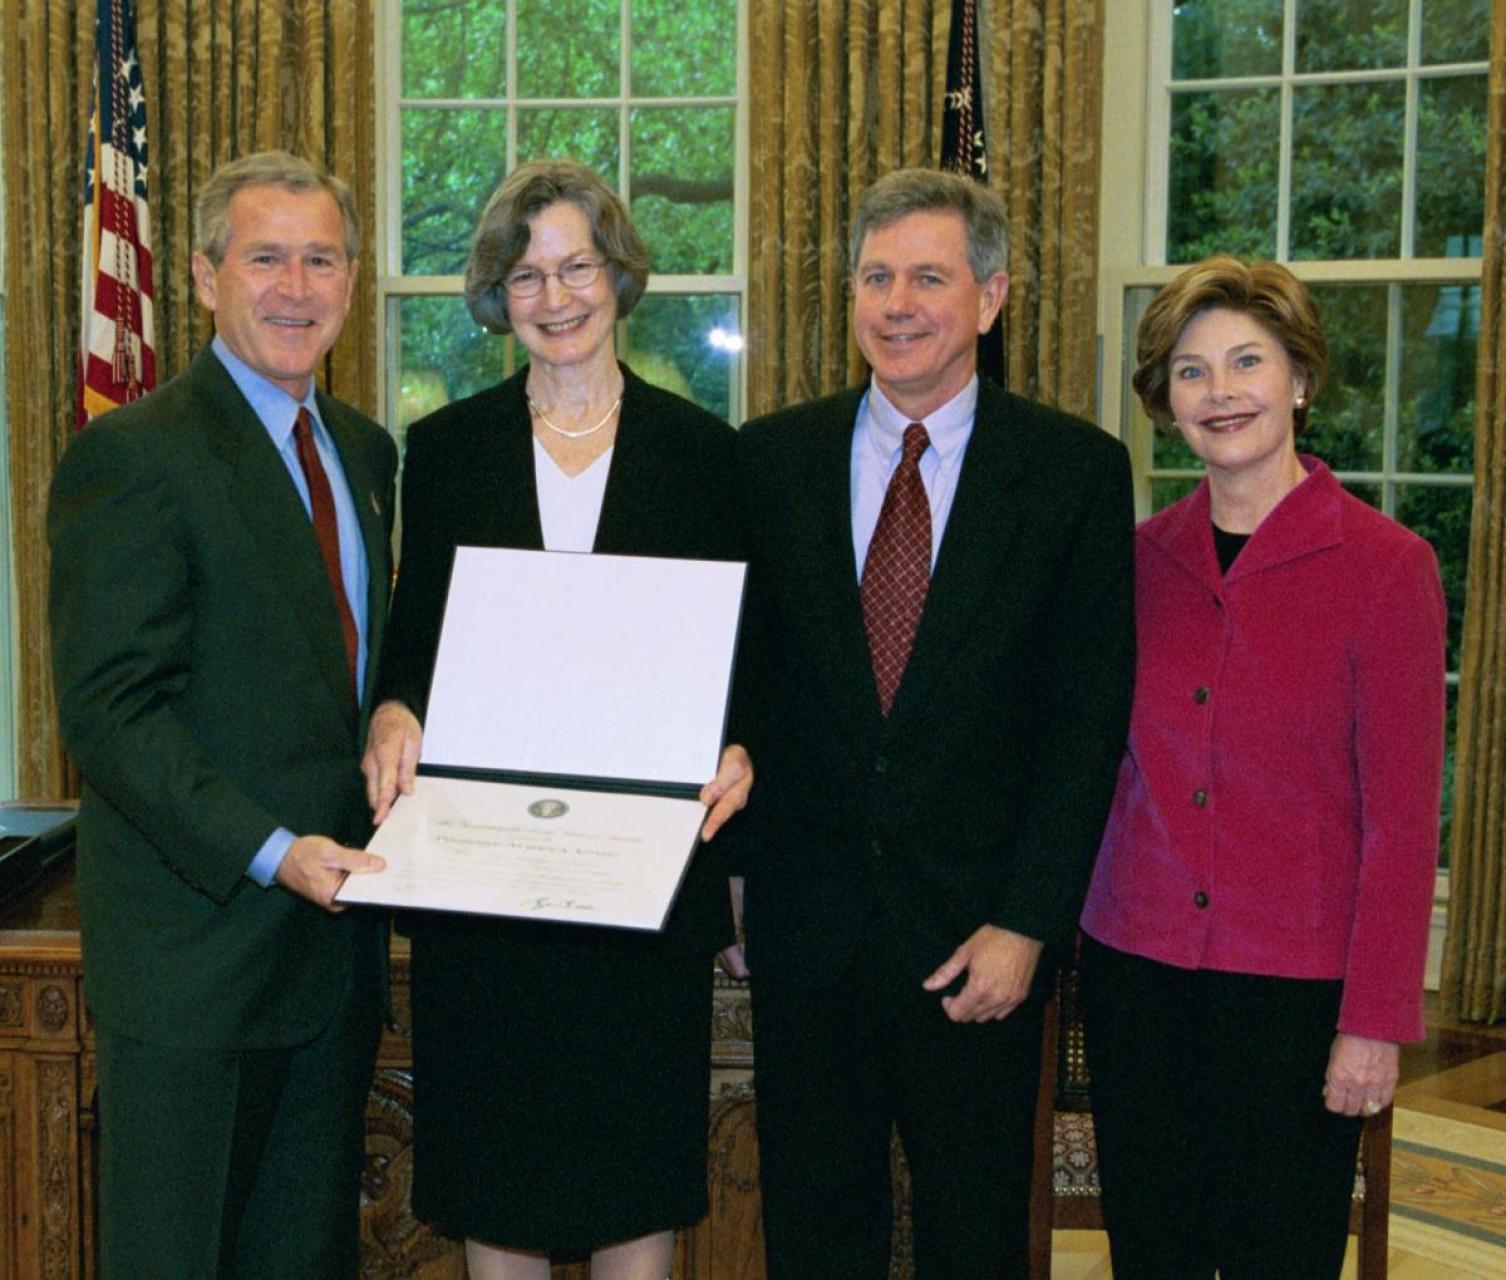 President George W. Bush and First Lady Laura Bush presenting the inaugural Preserve America Presidential Award to Wayne Martin and former NCAC Executive Director Mary B Regan